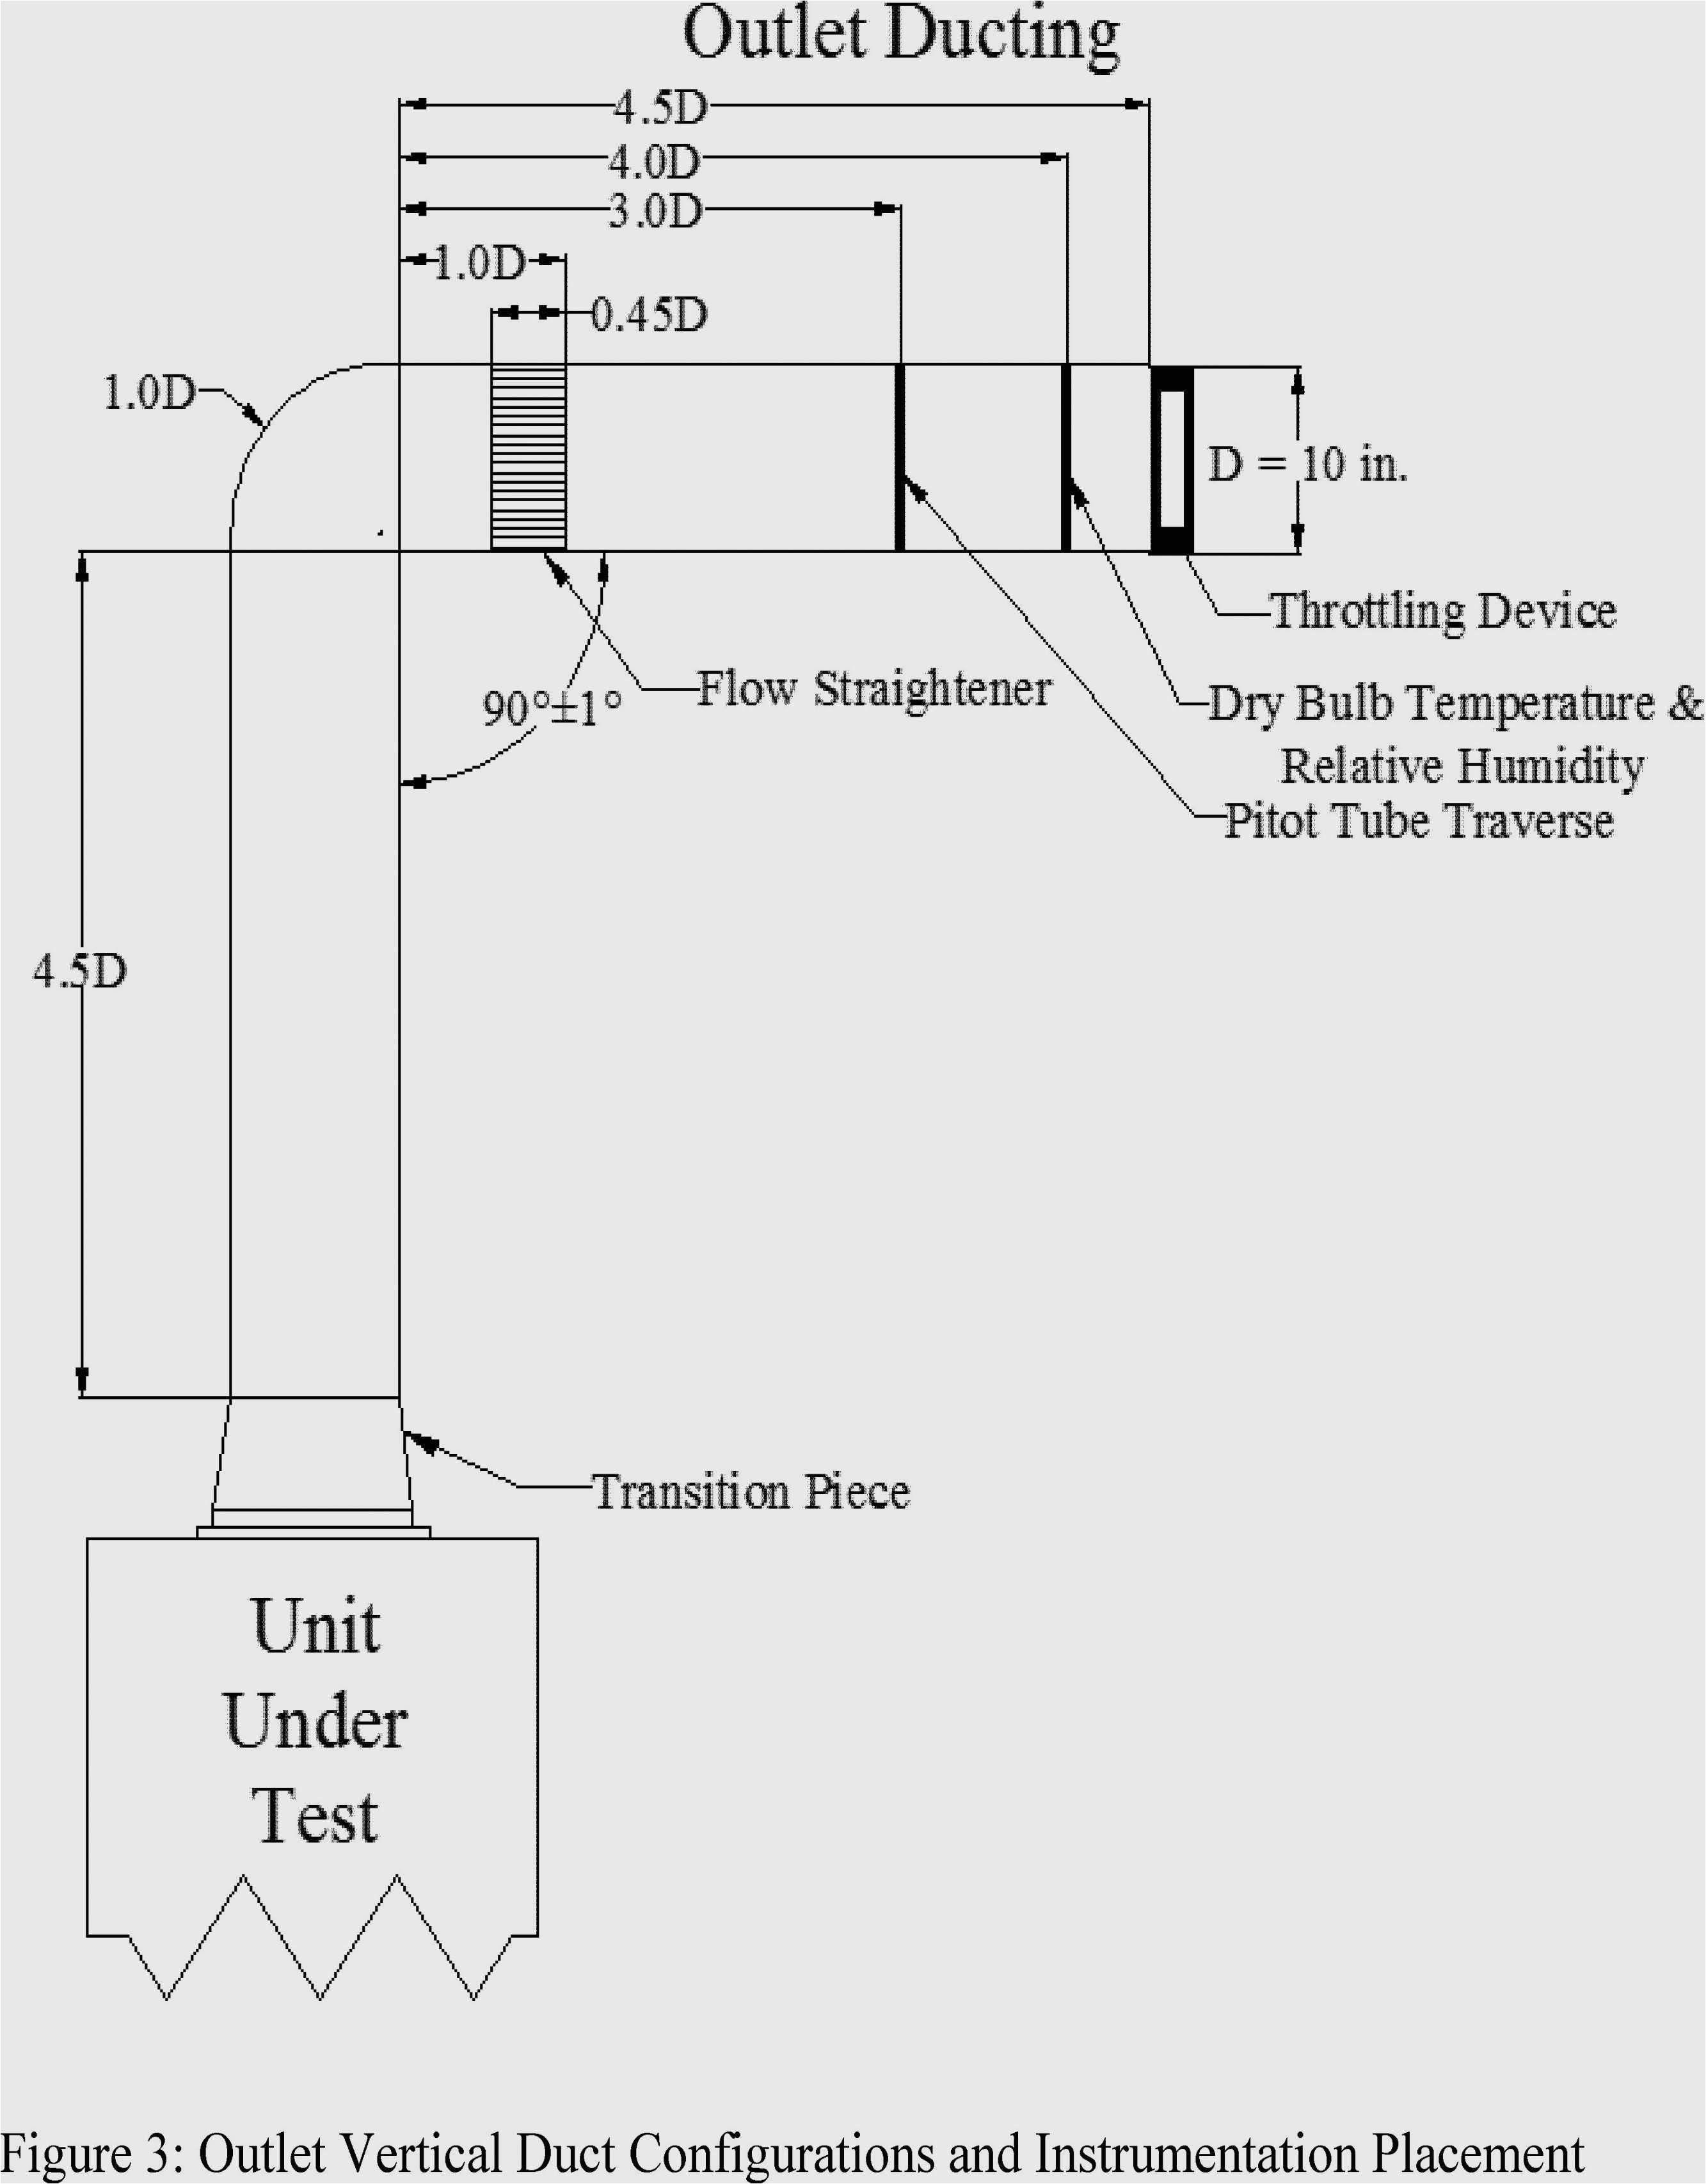 Wiring Diagram 3 Way Switch Wiring Diagram 3 Way Switch Inspirational 3 Way Switch Wiring